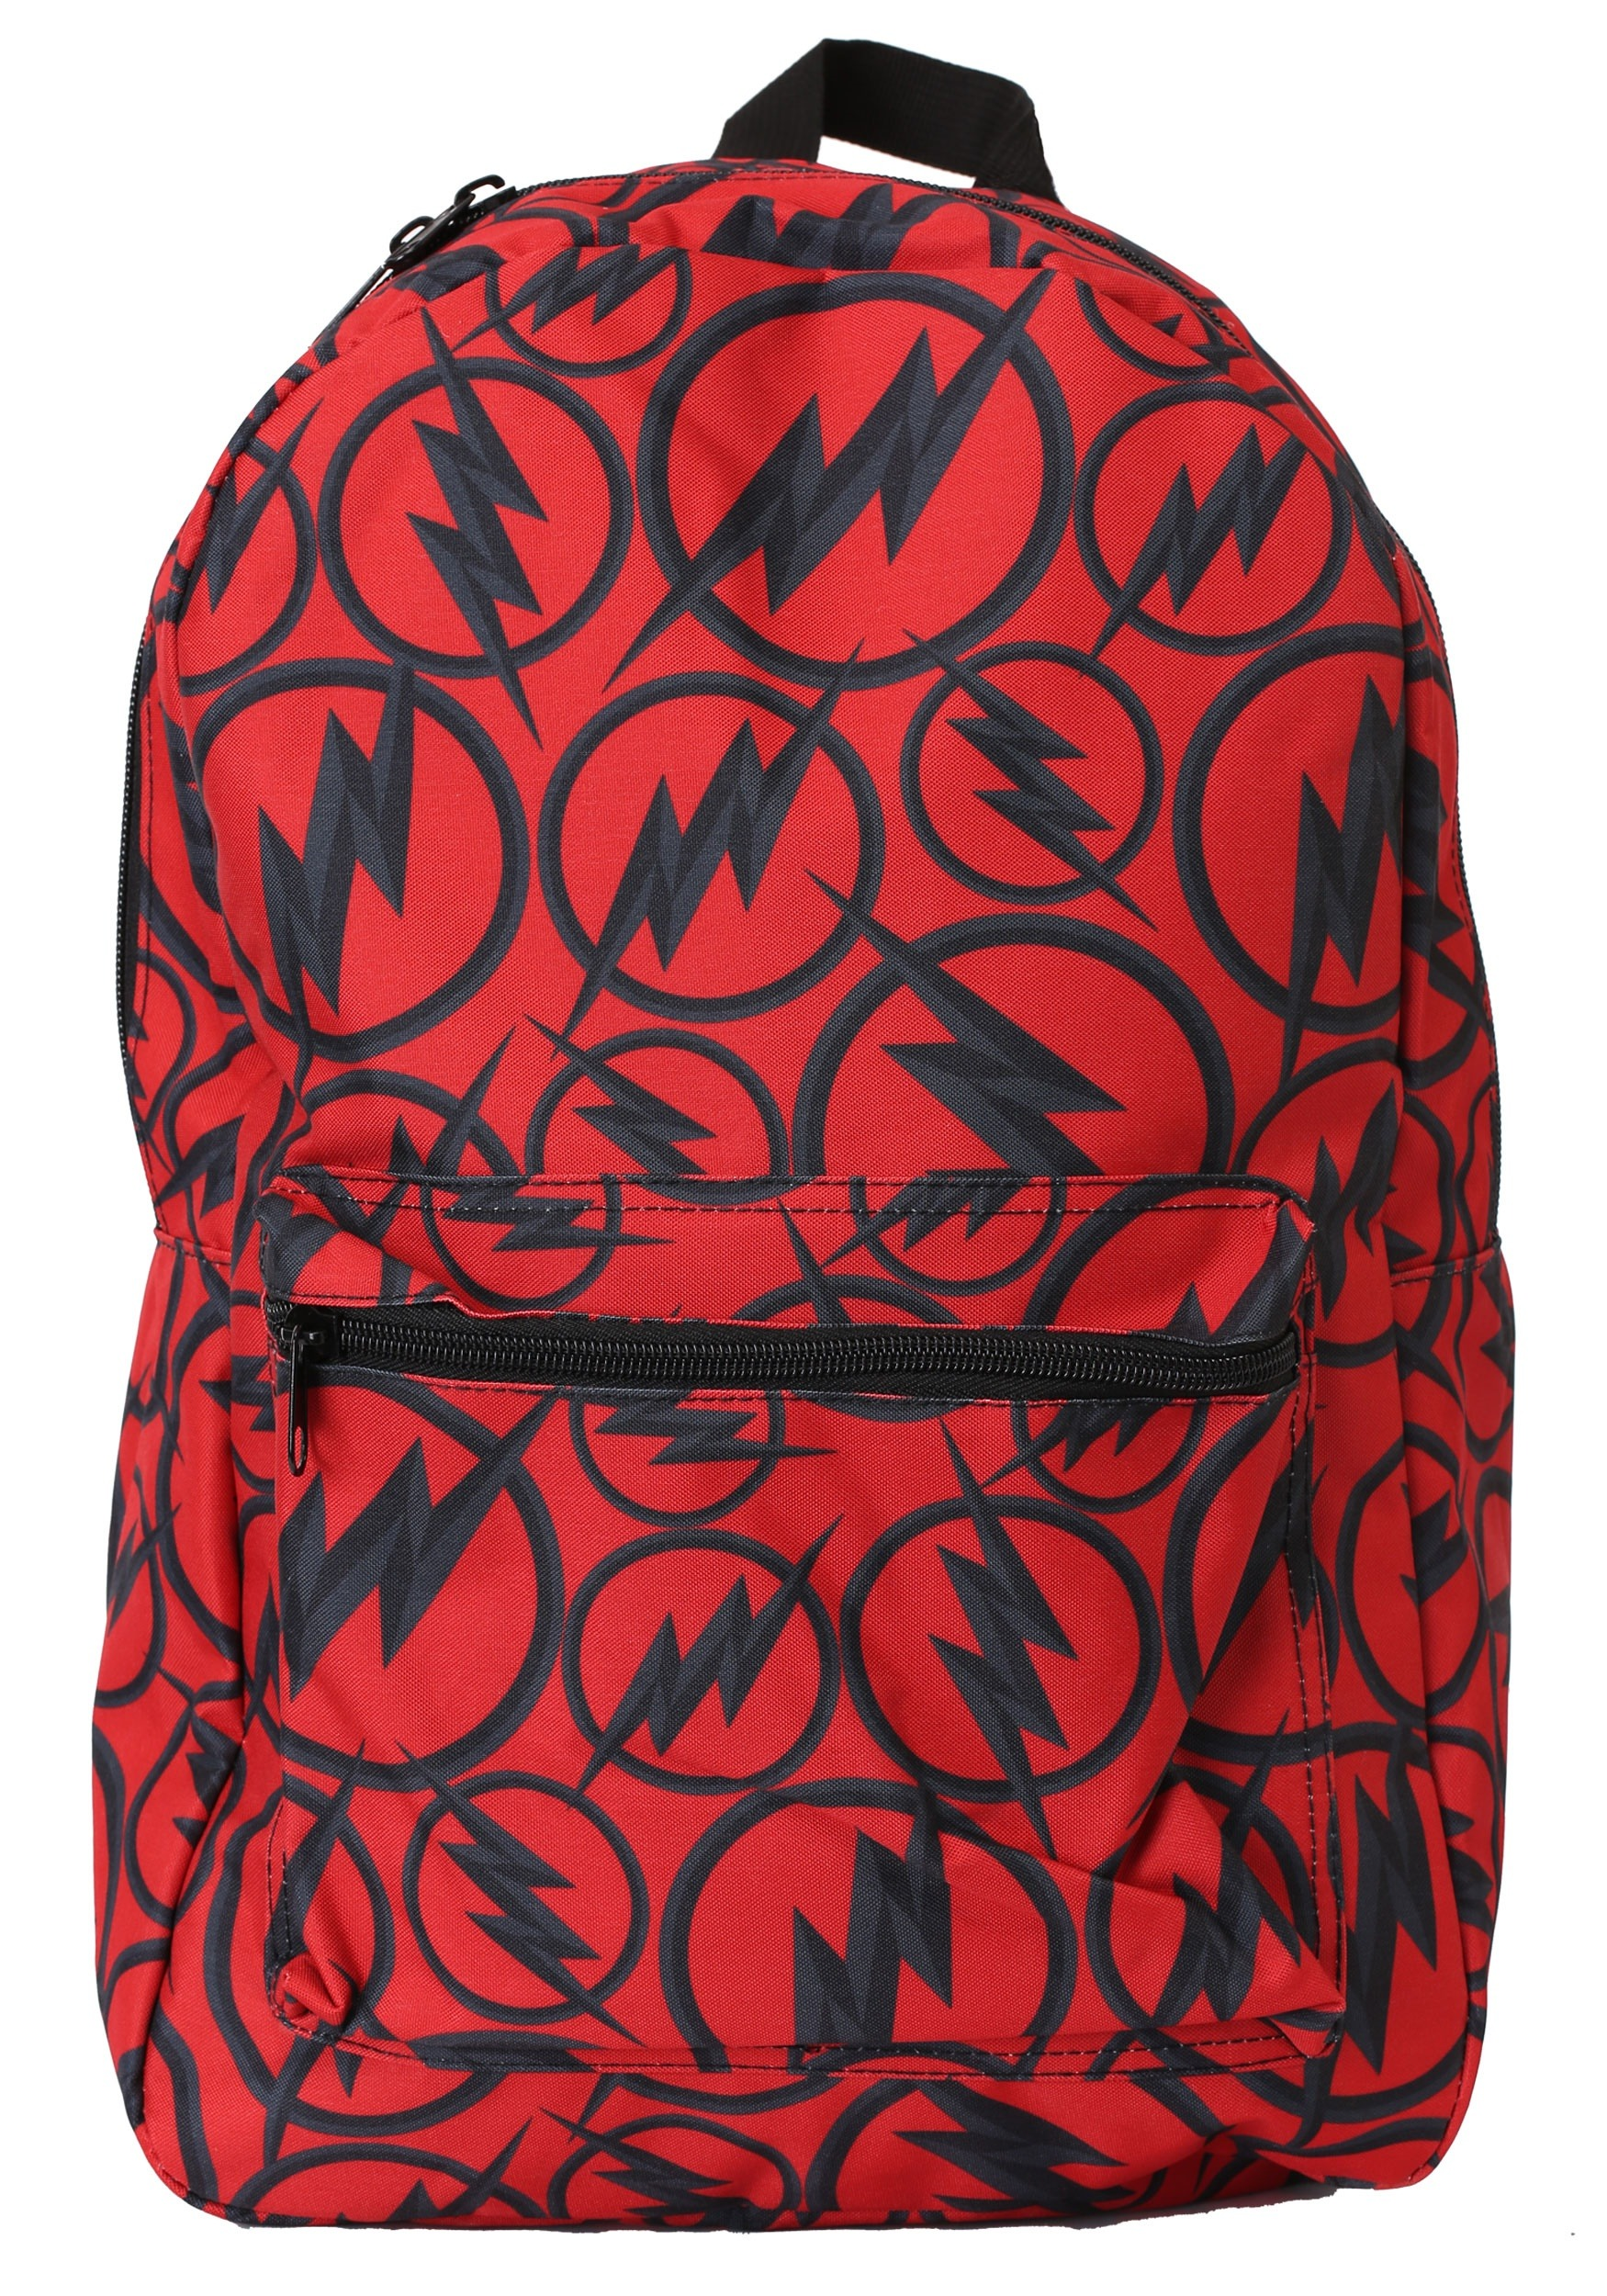 955e23cc28 Backpack The Flash Dark Logo All Over Print